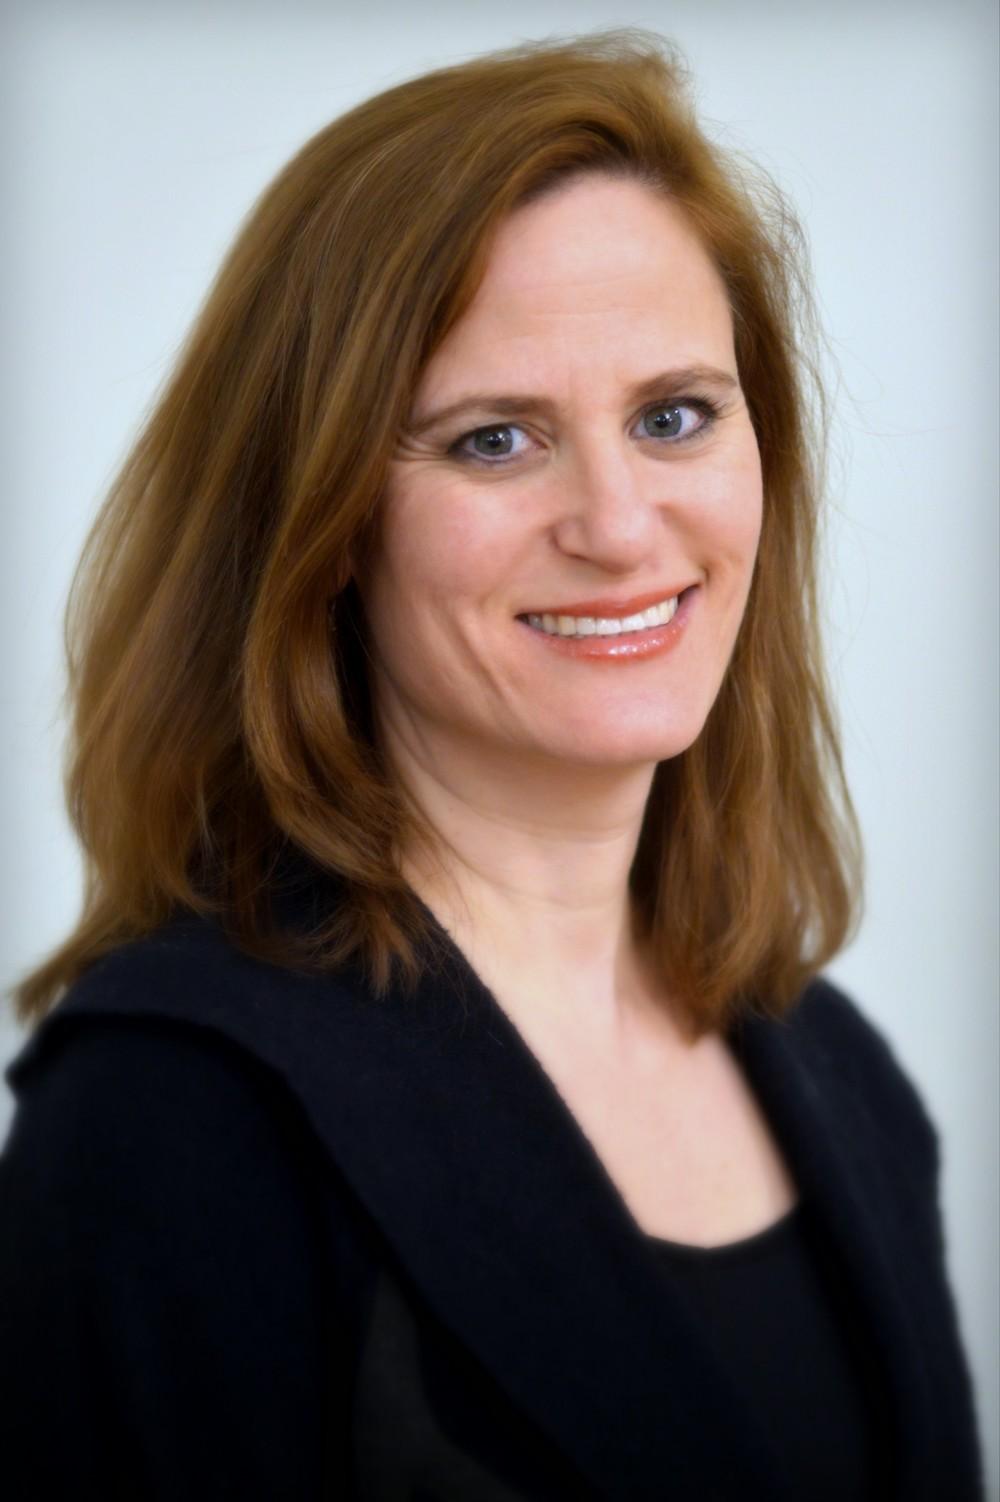 Laura Fein